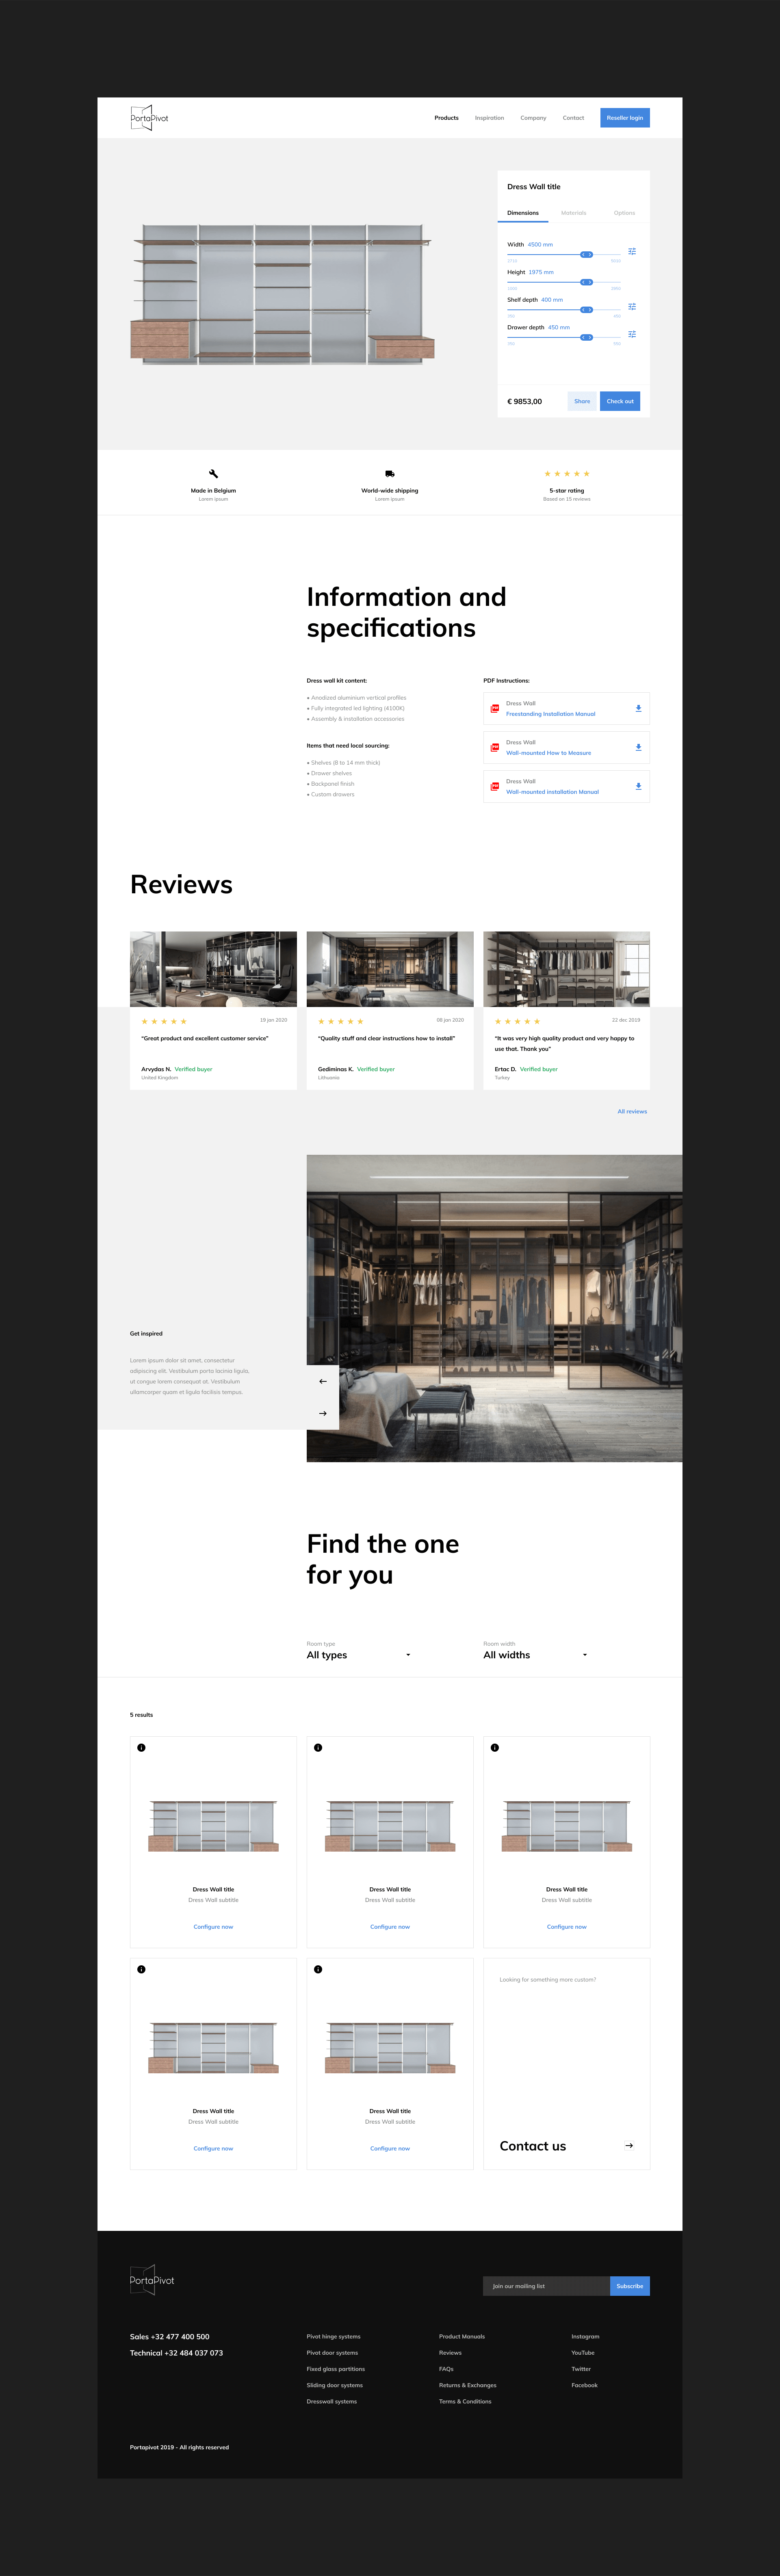 Dress Wall configurator page